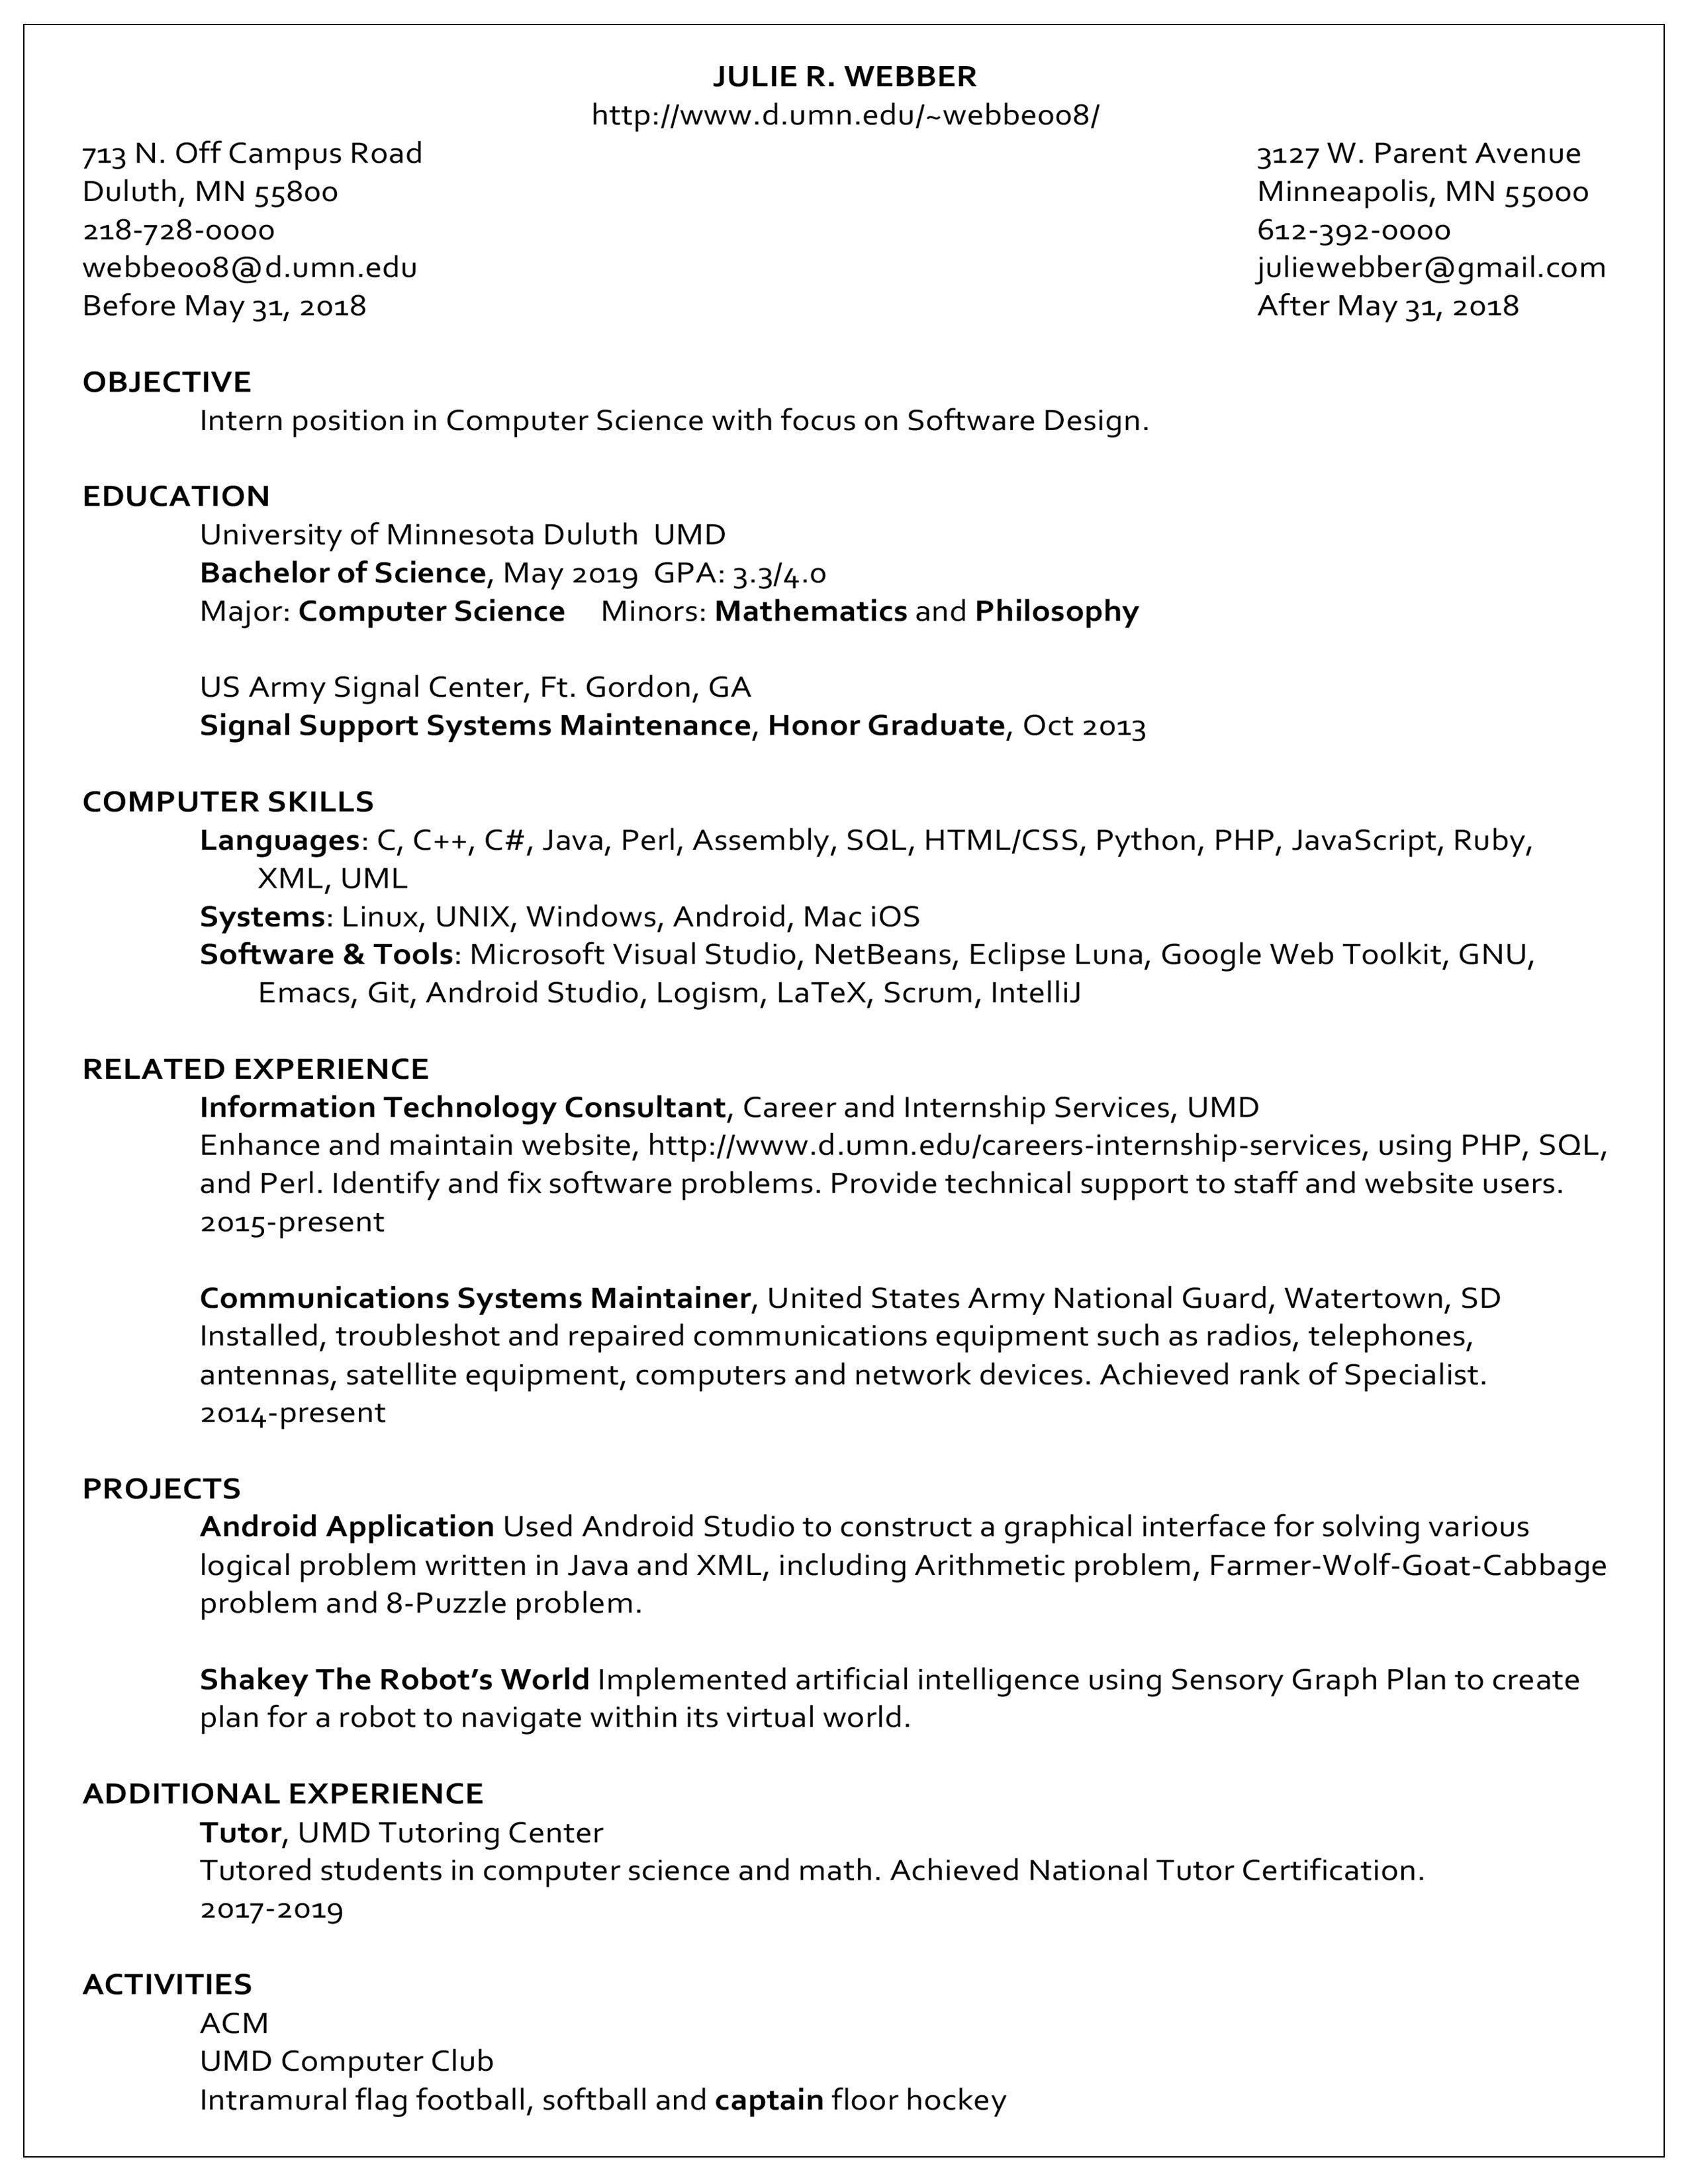 Resume examples career internship services umn